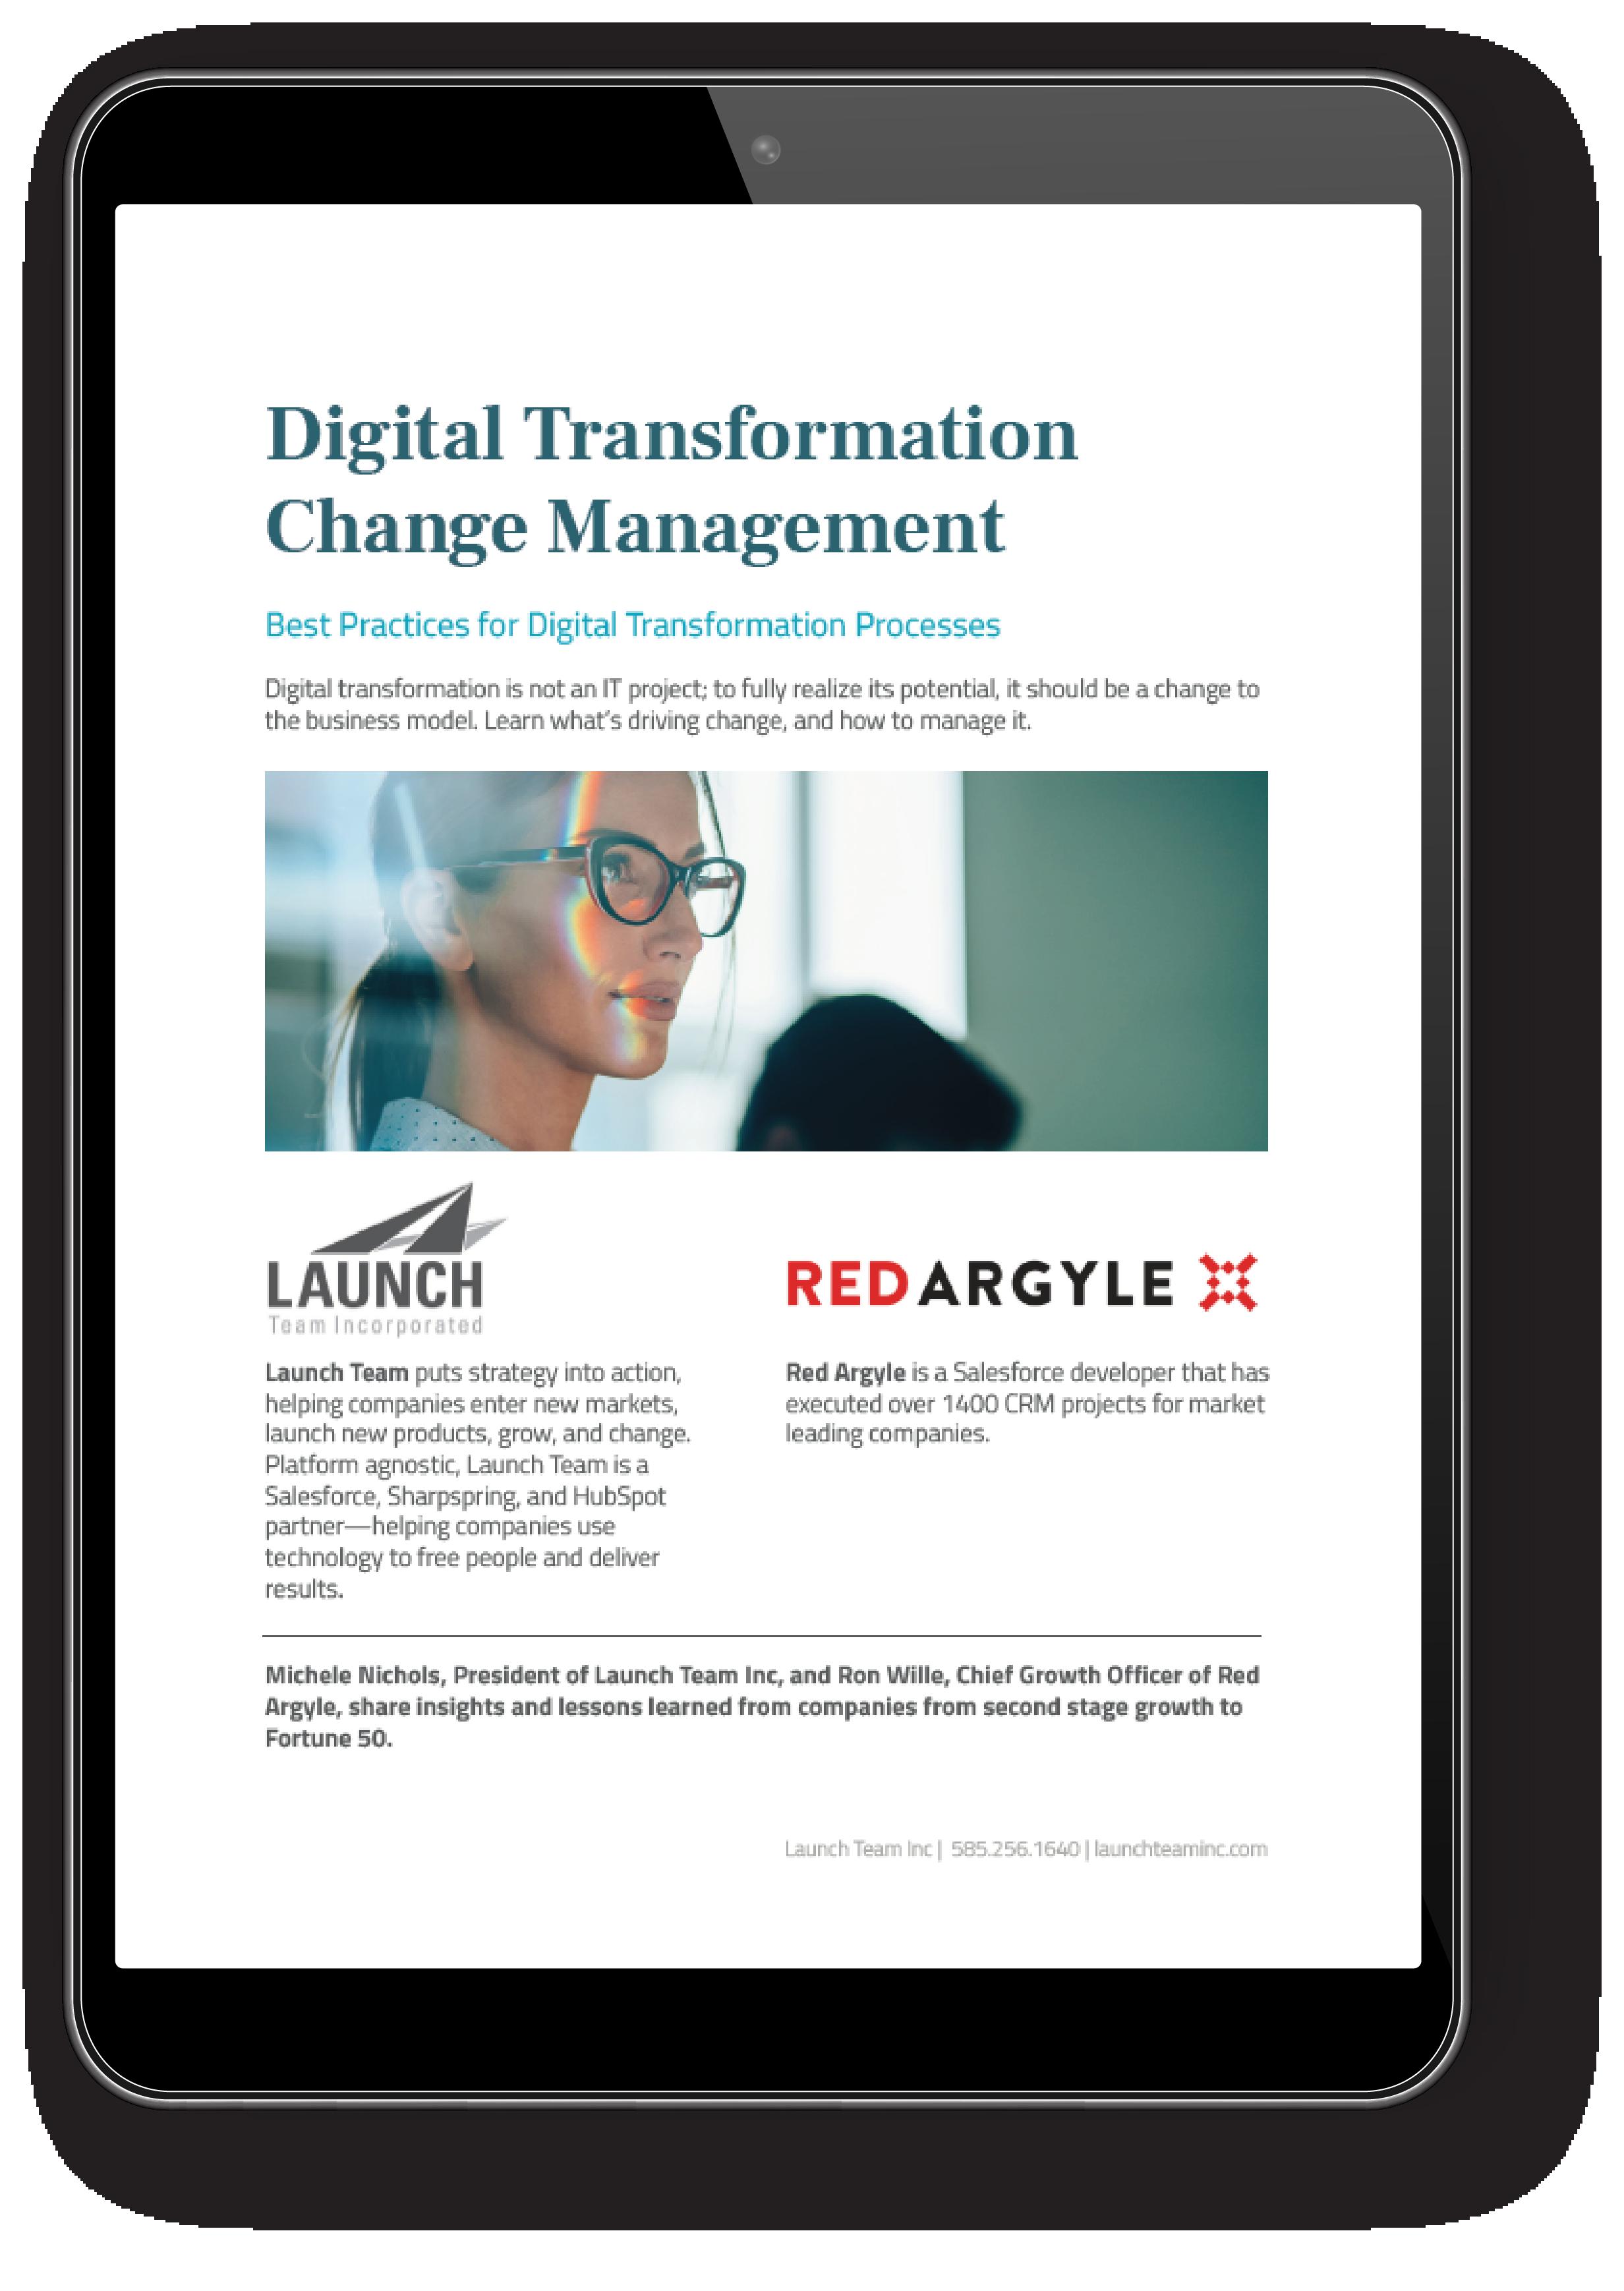 digital transformation ebook in ipad